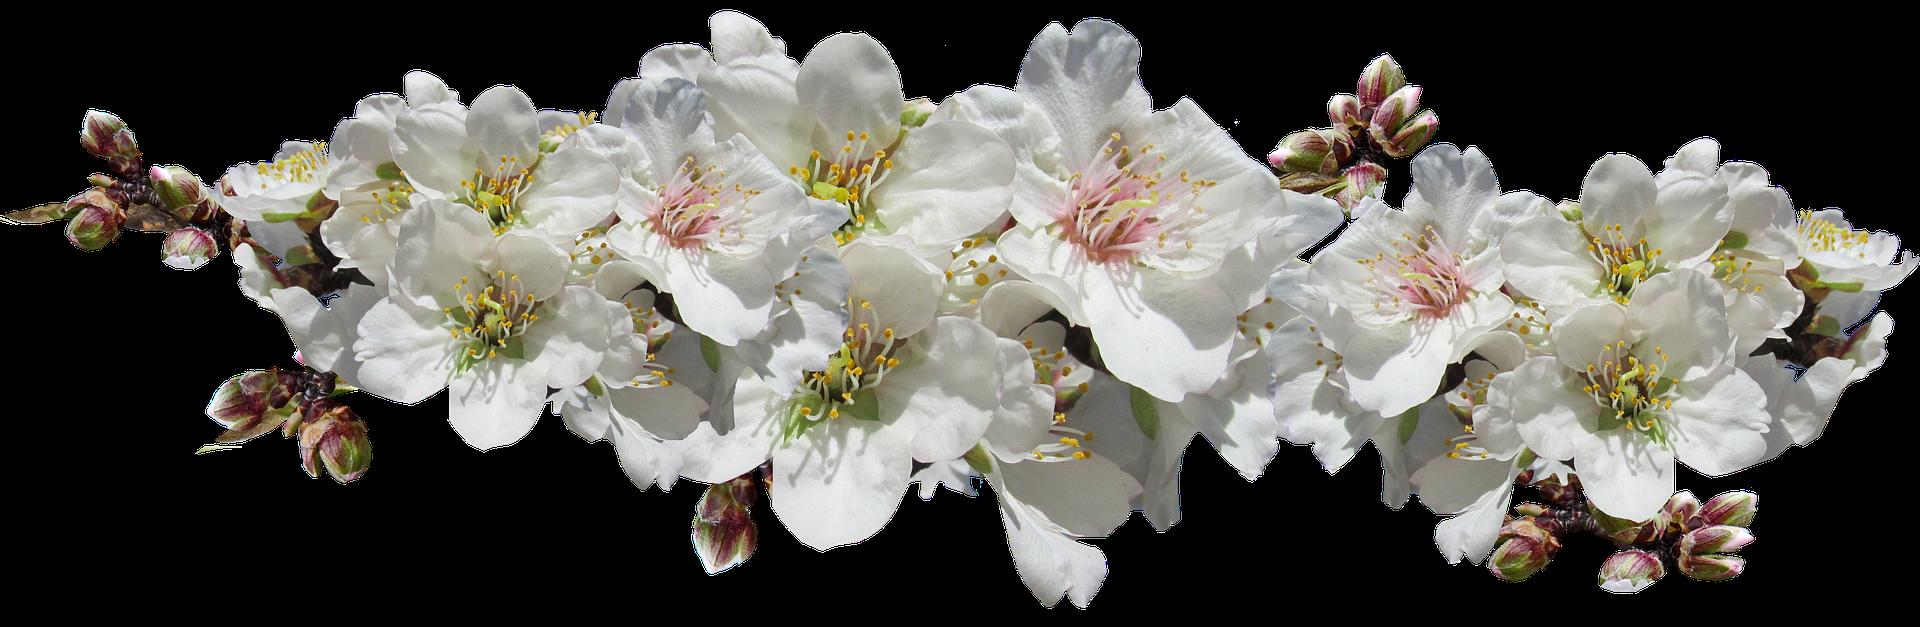 flowers-4507585_1920